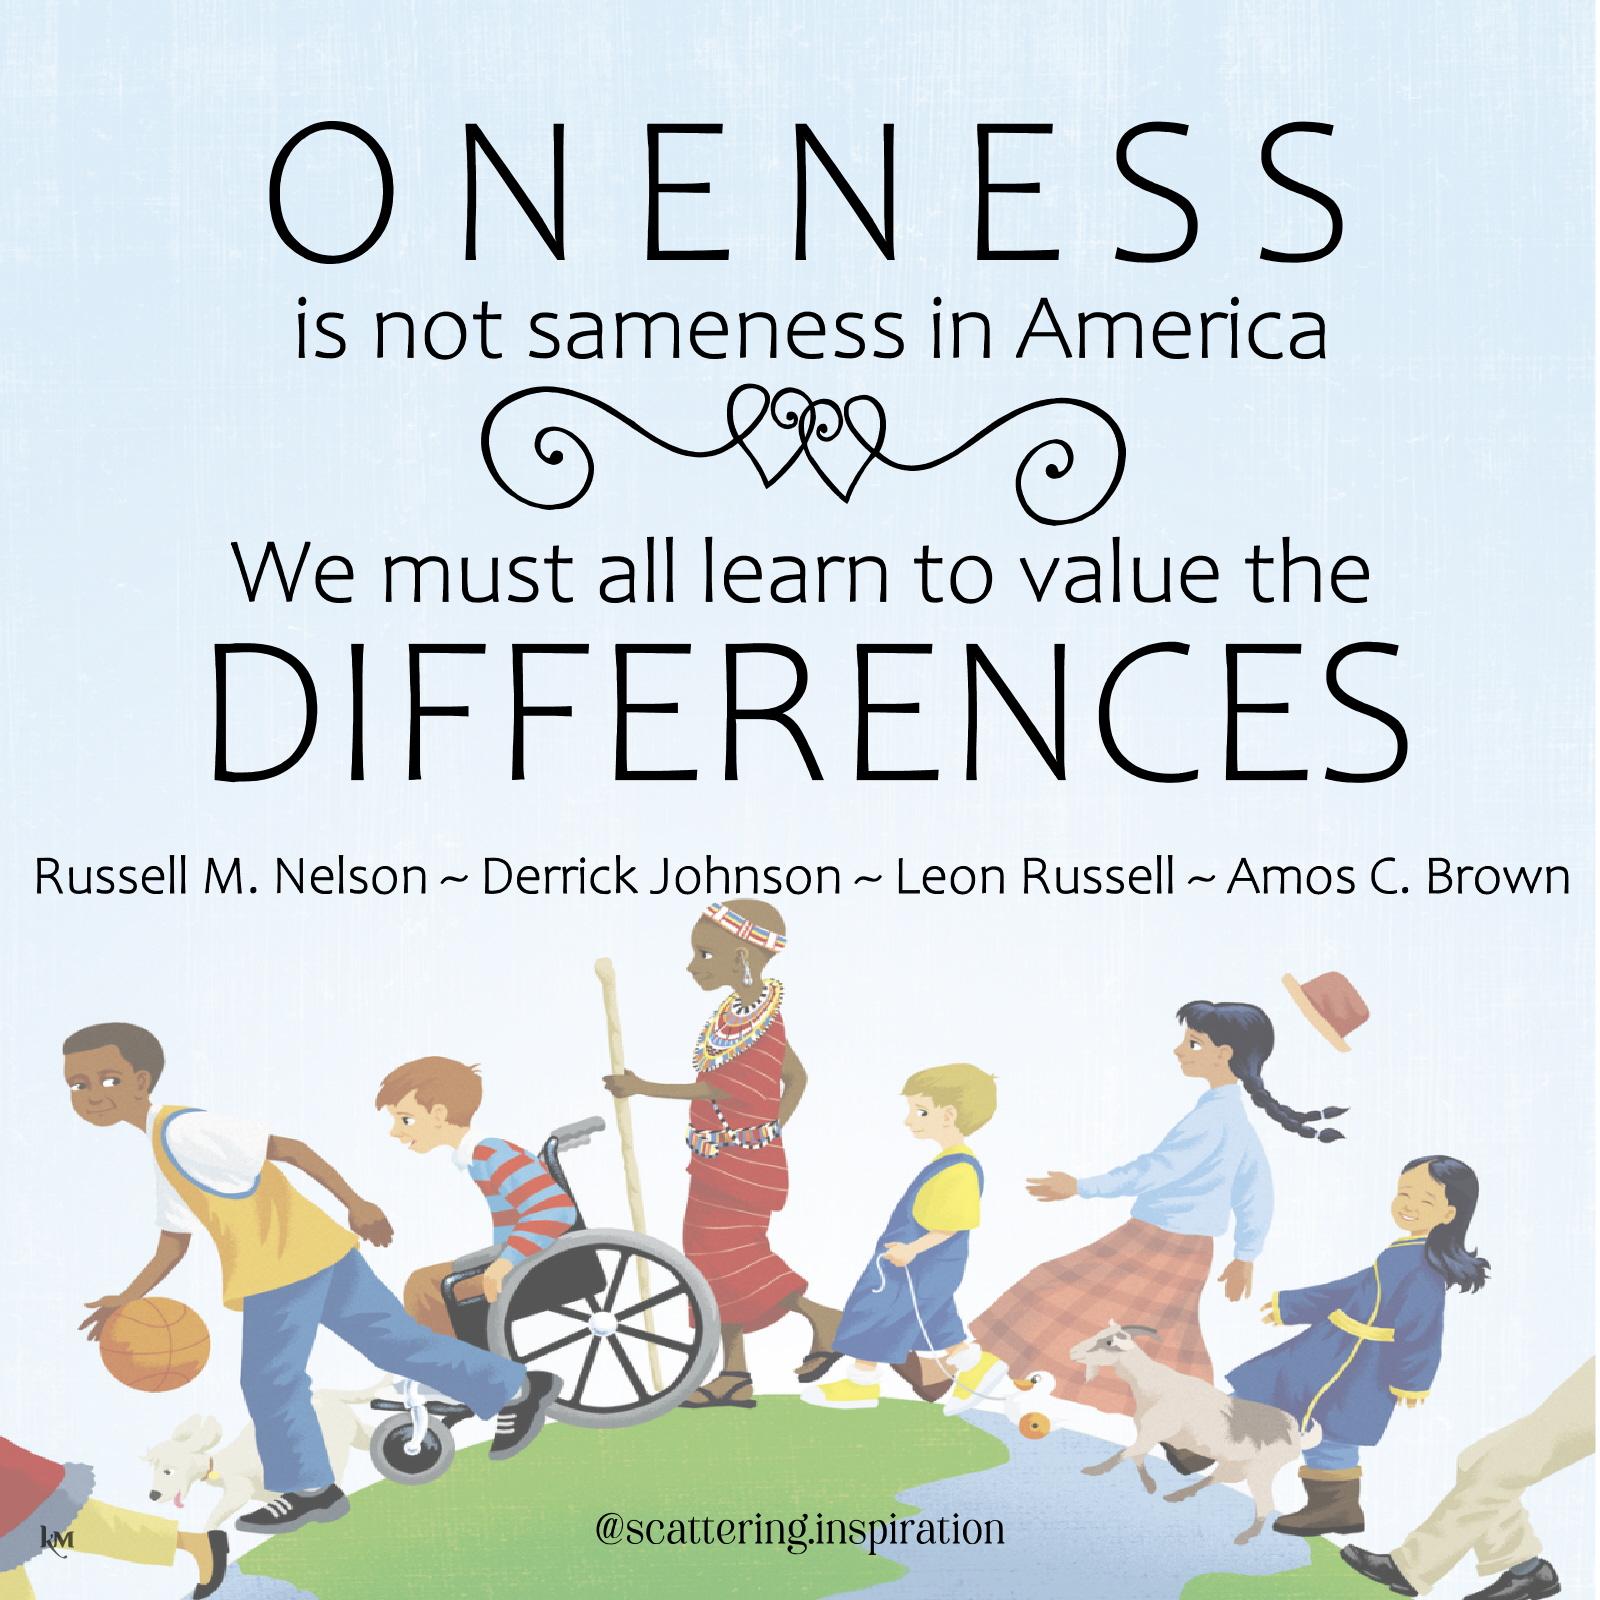 oneness not sameness